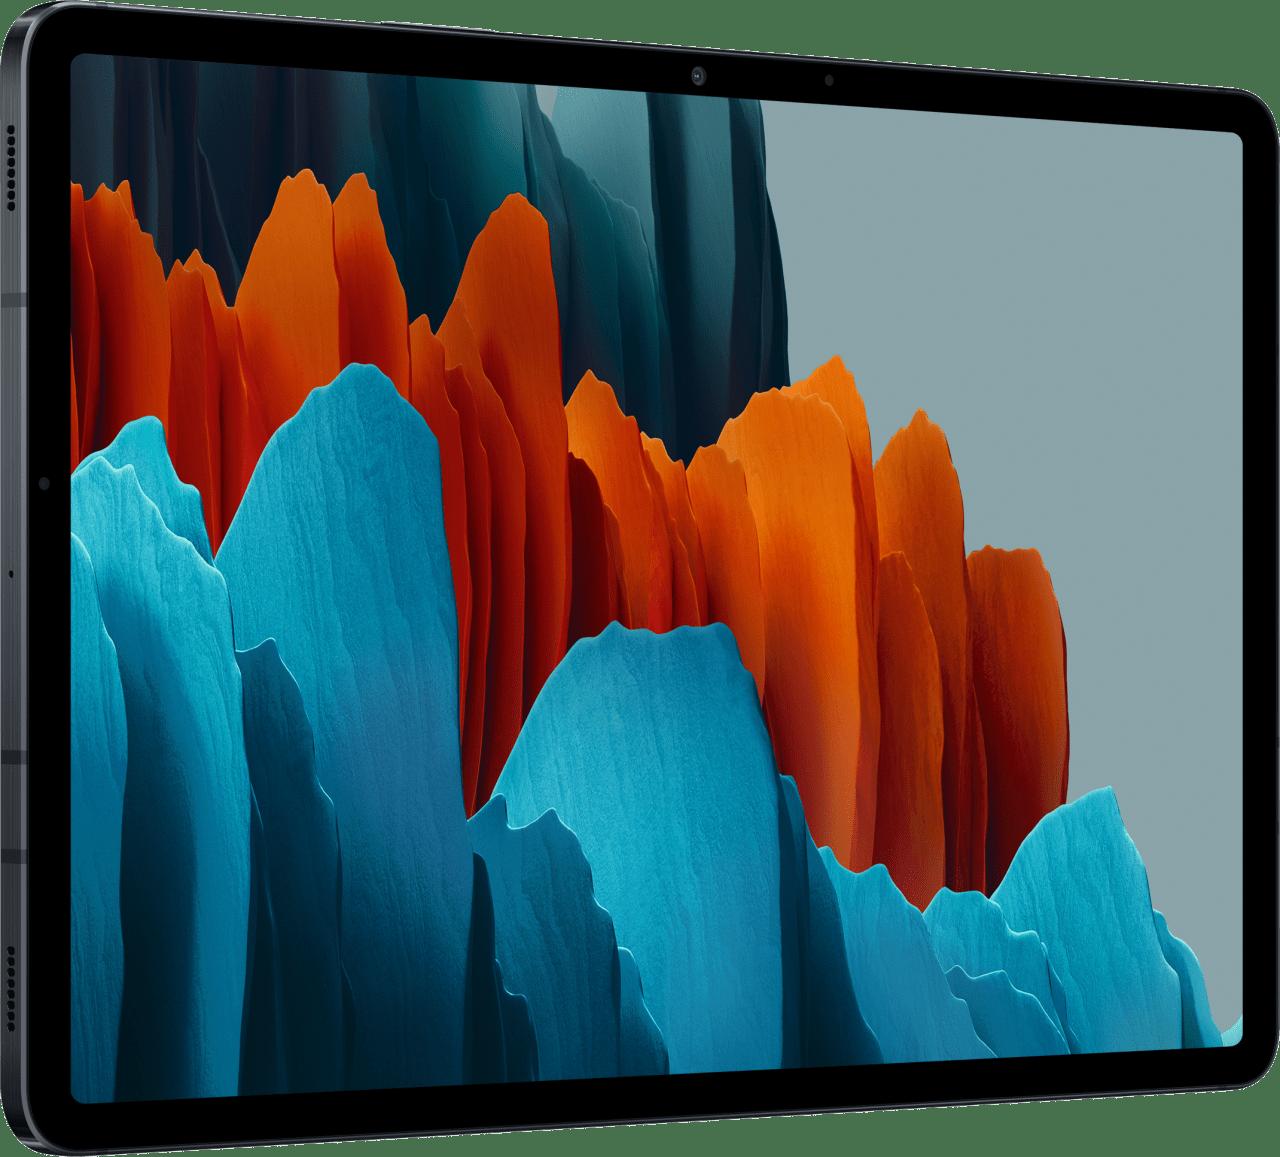 Mystic Black Samsung Tablet Galaxy Tab S7 (2020) - LTE - Android™ 10 - 128GB.4